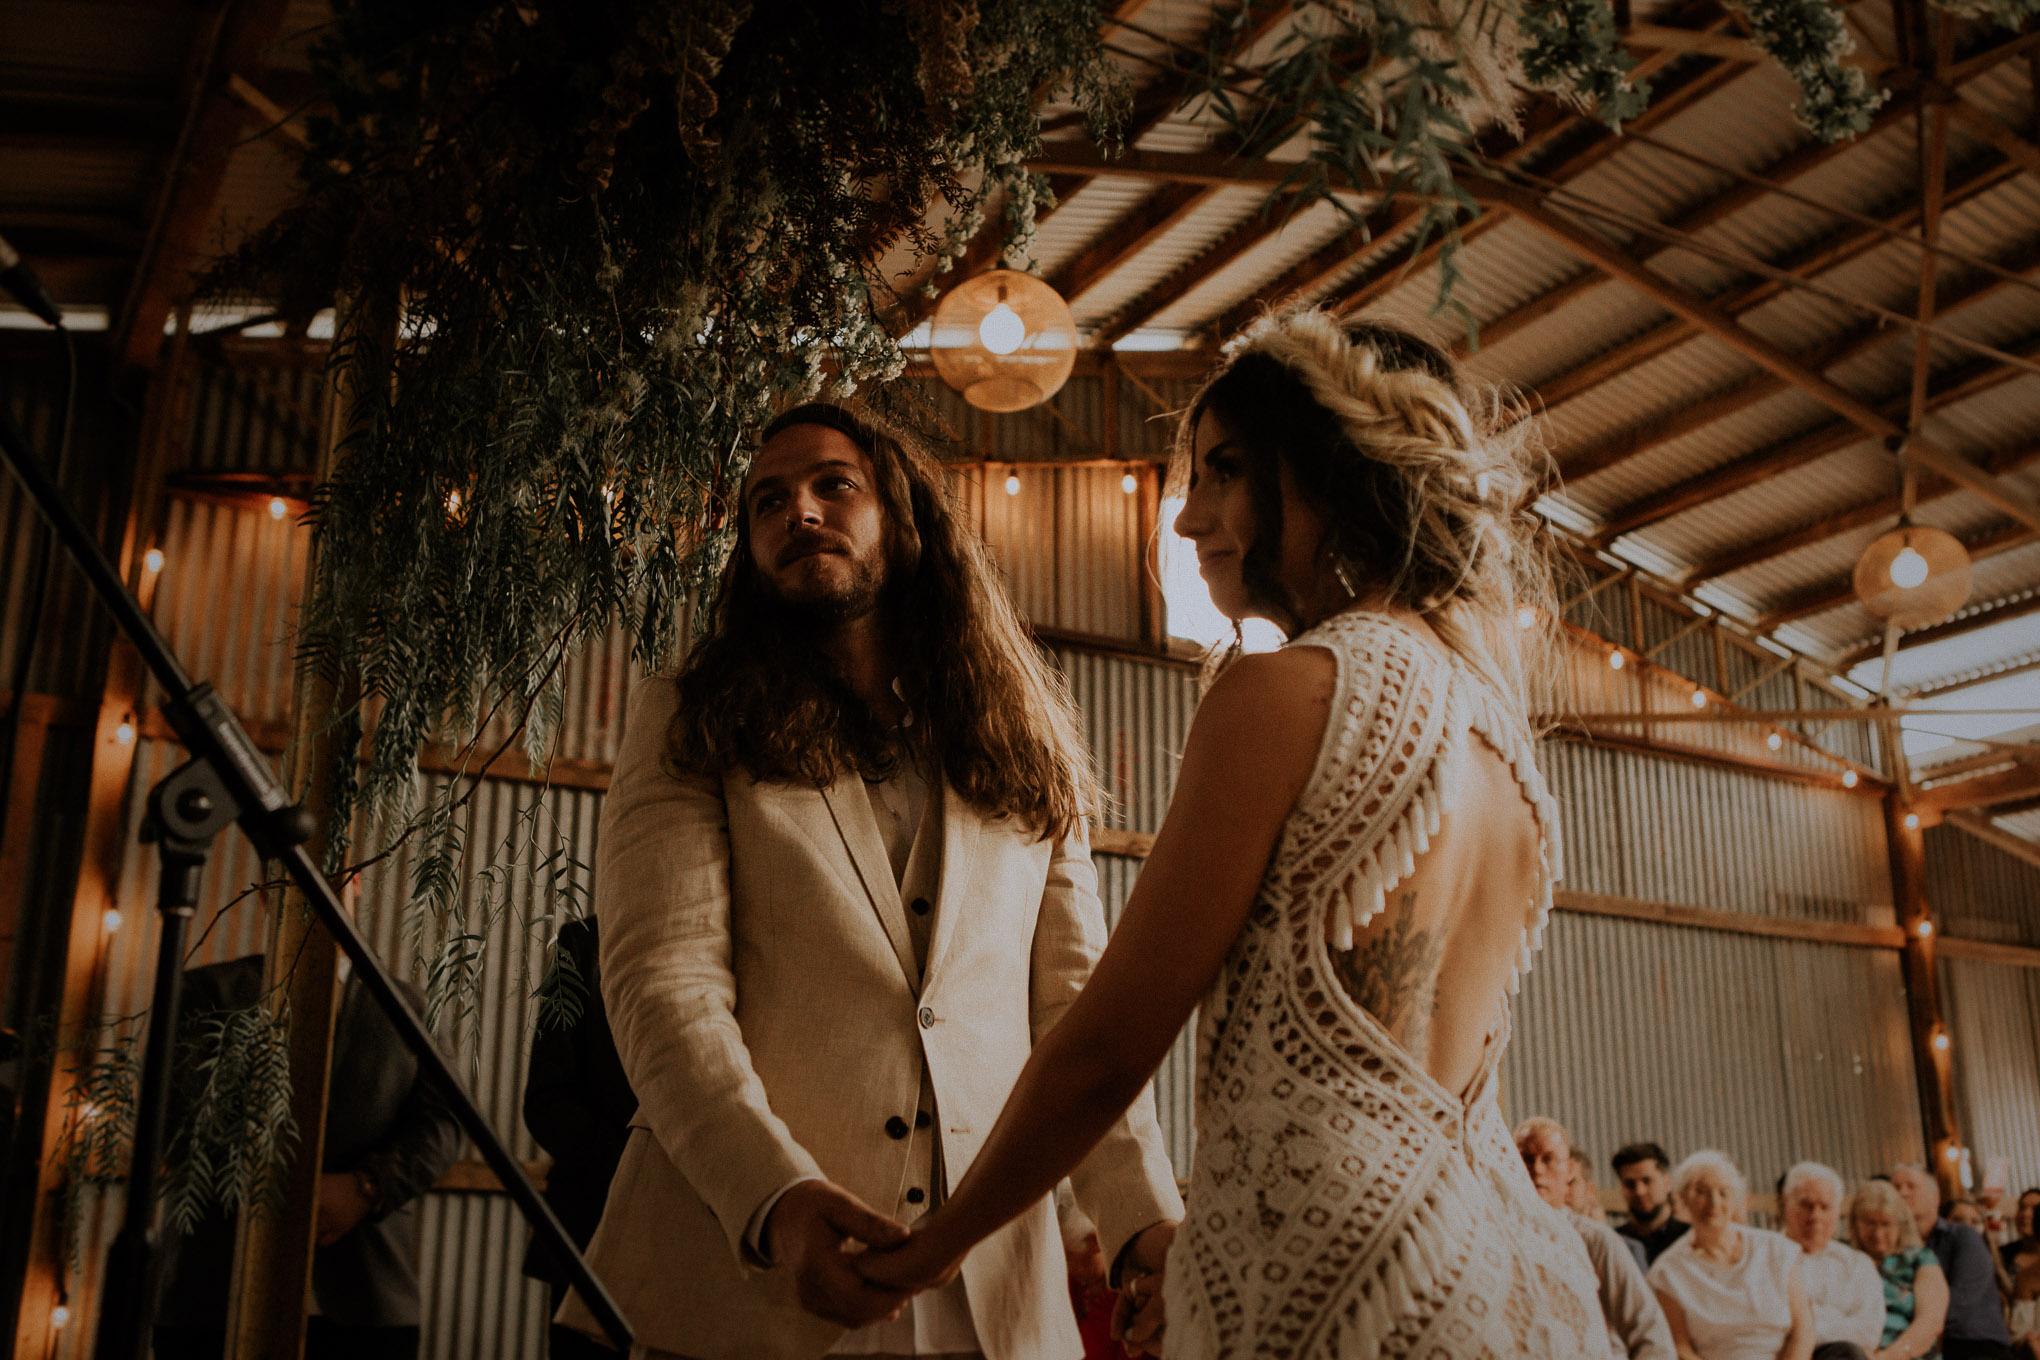 Boho chic wedding ceremony in a rustic shearing shed at Waldara Farm